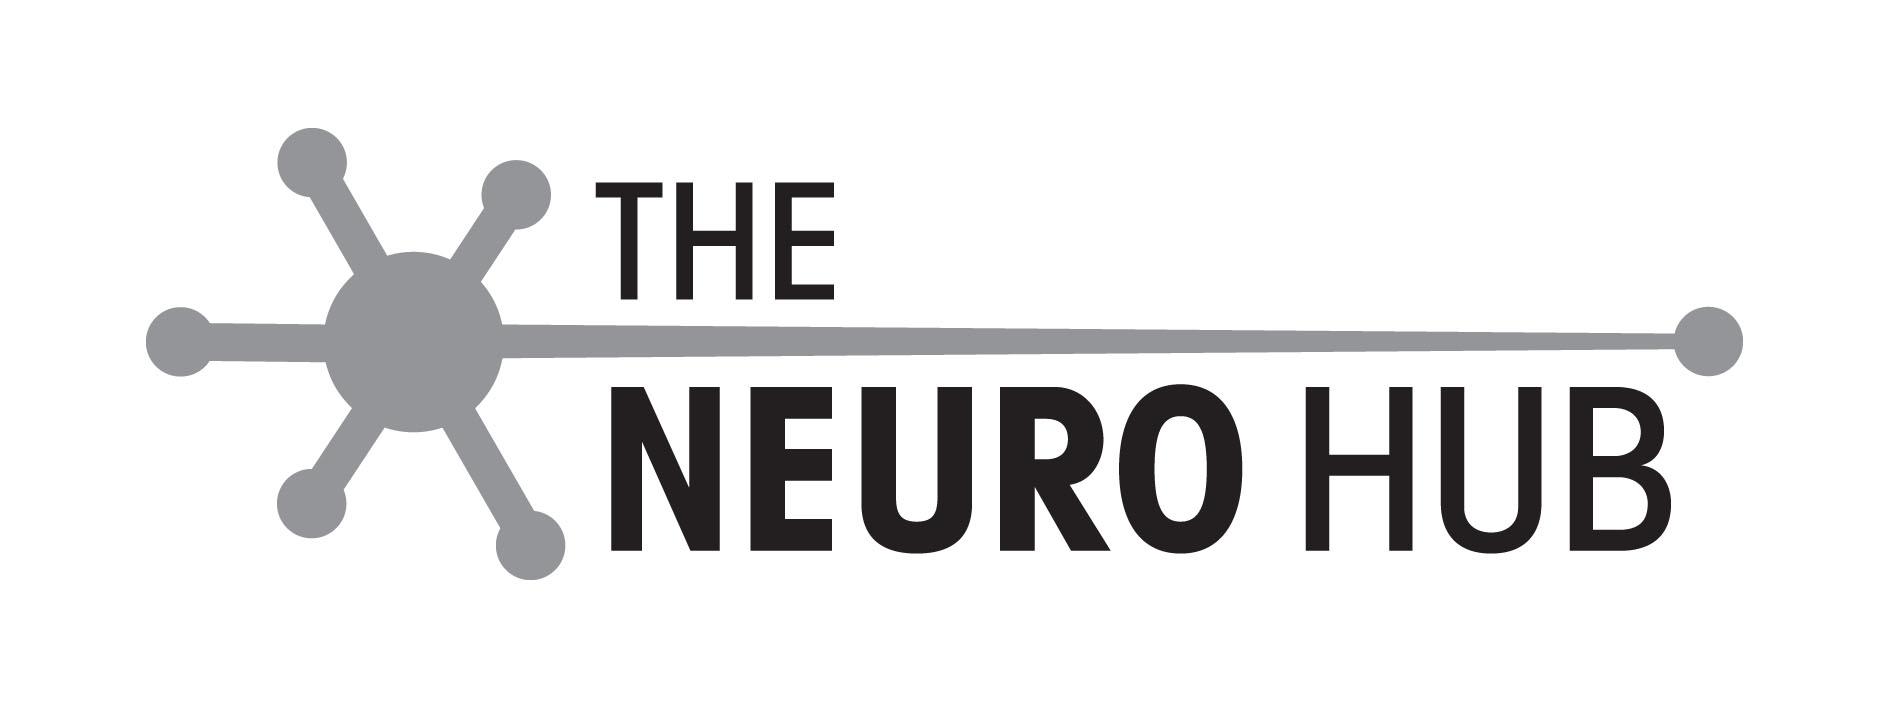 Neuro Hub 300dpi